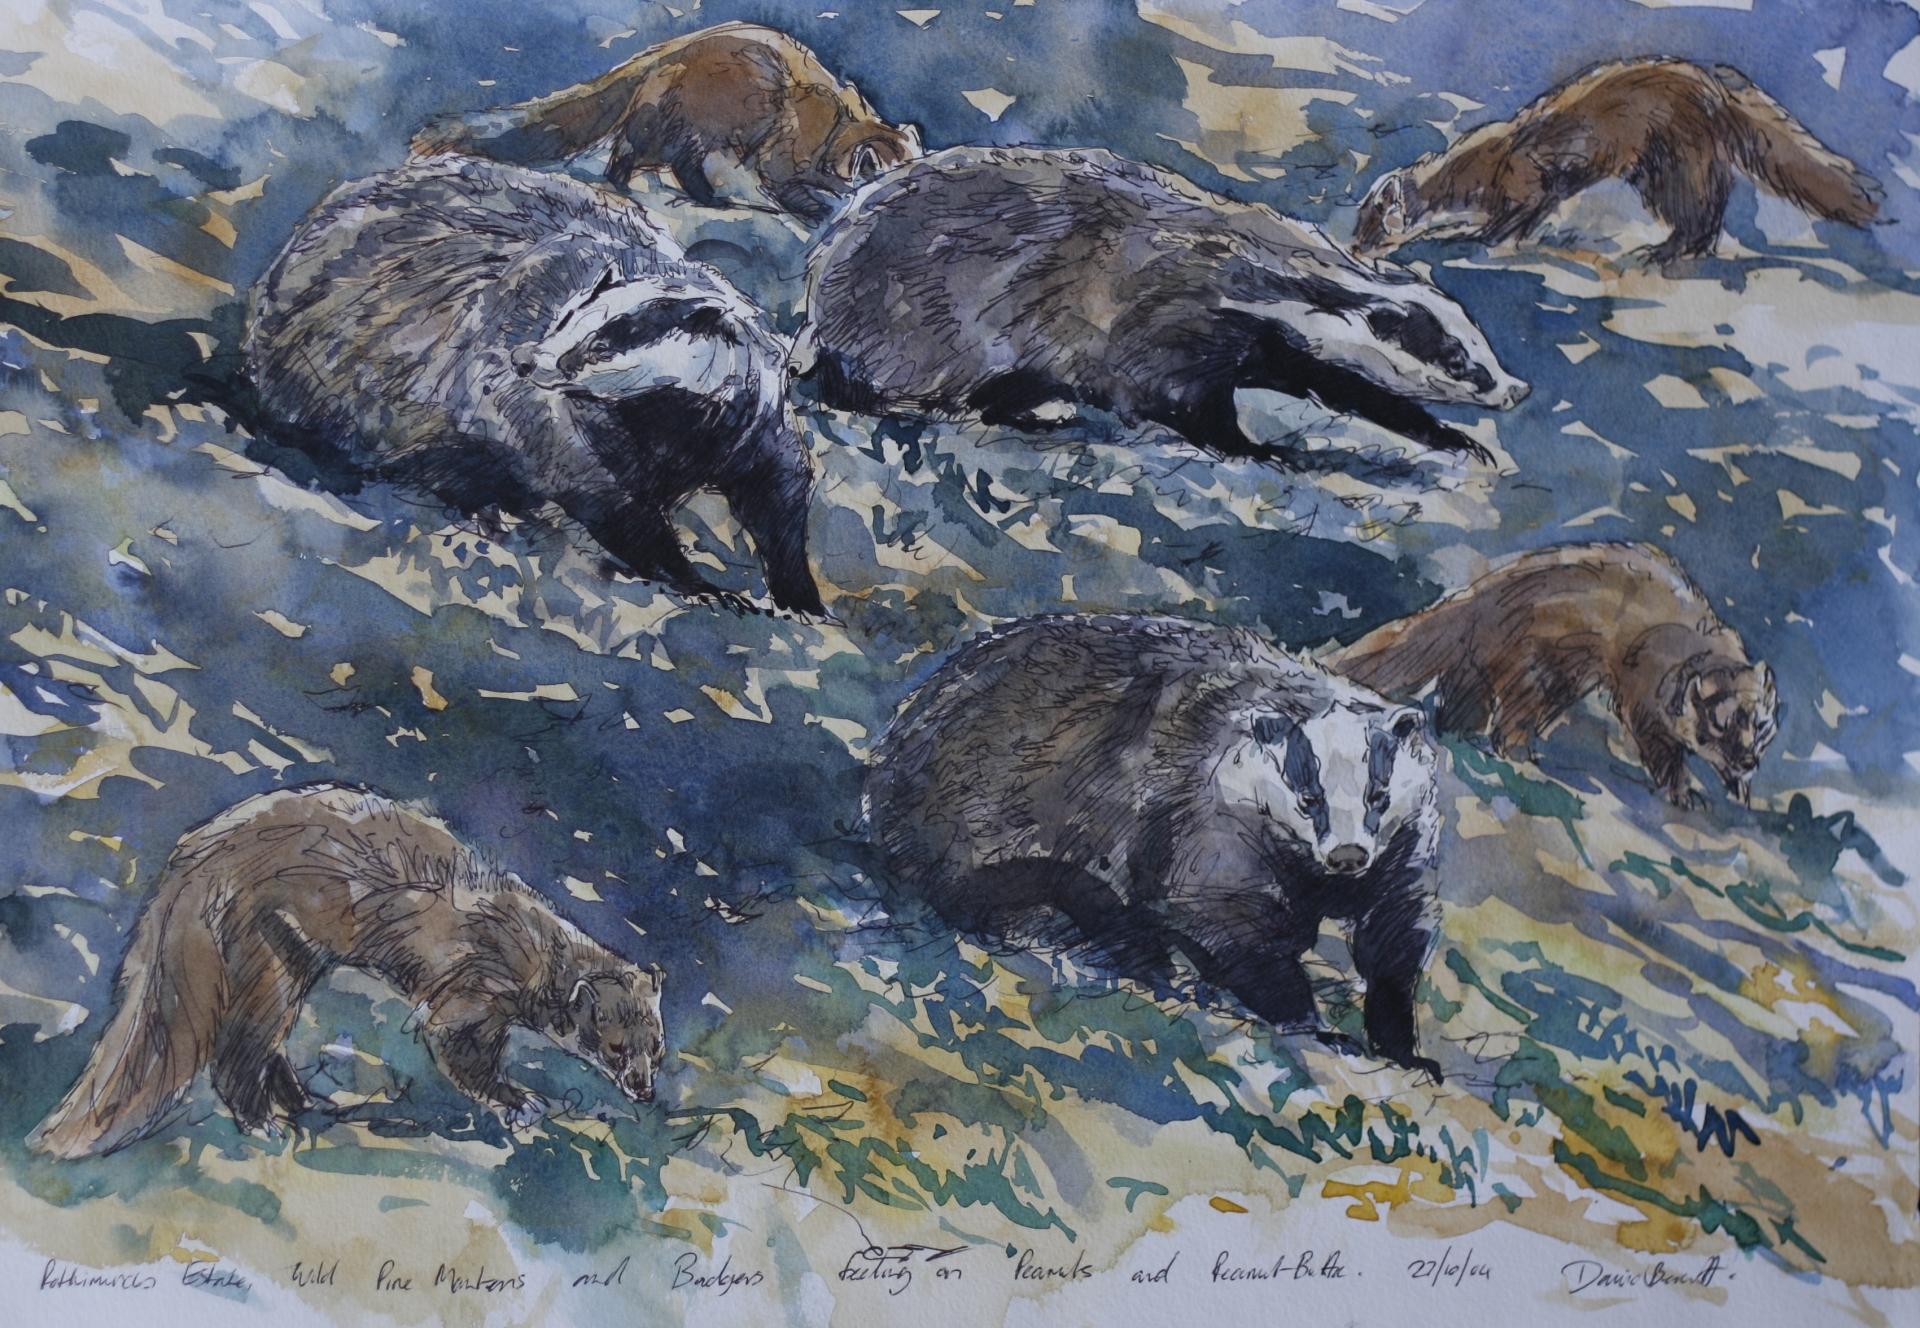 Badger and Pine Marten studies, Rothiemurchus estate